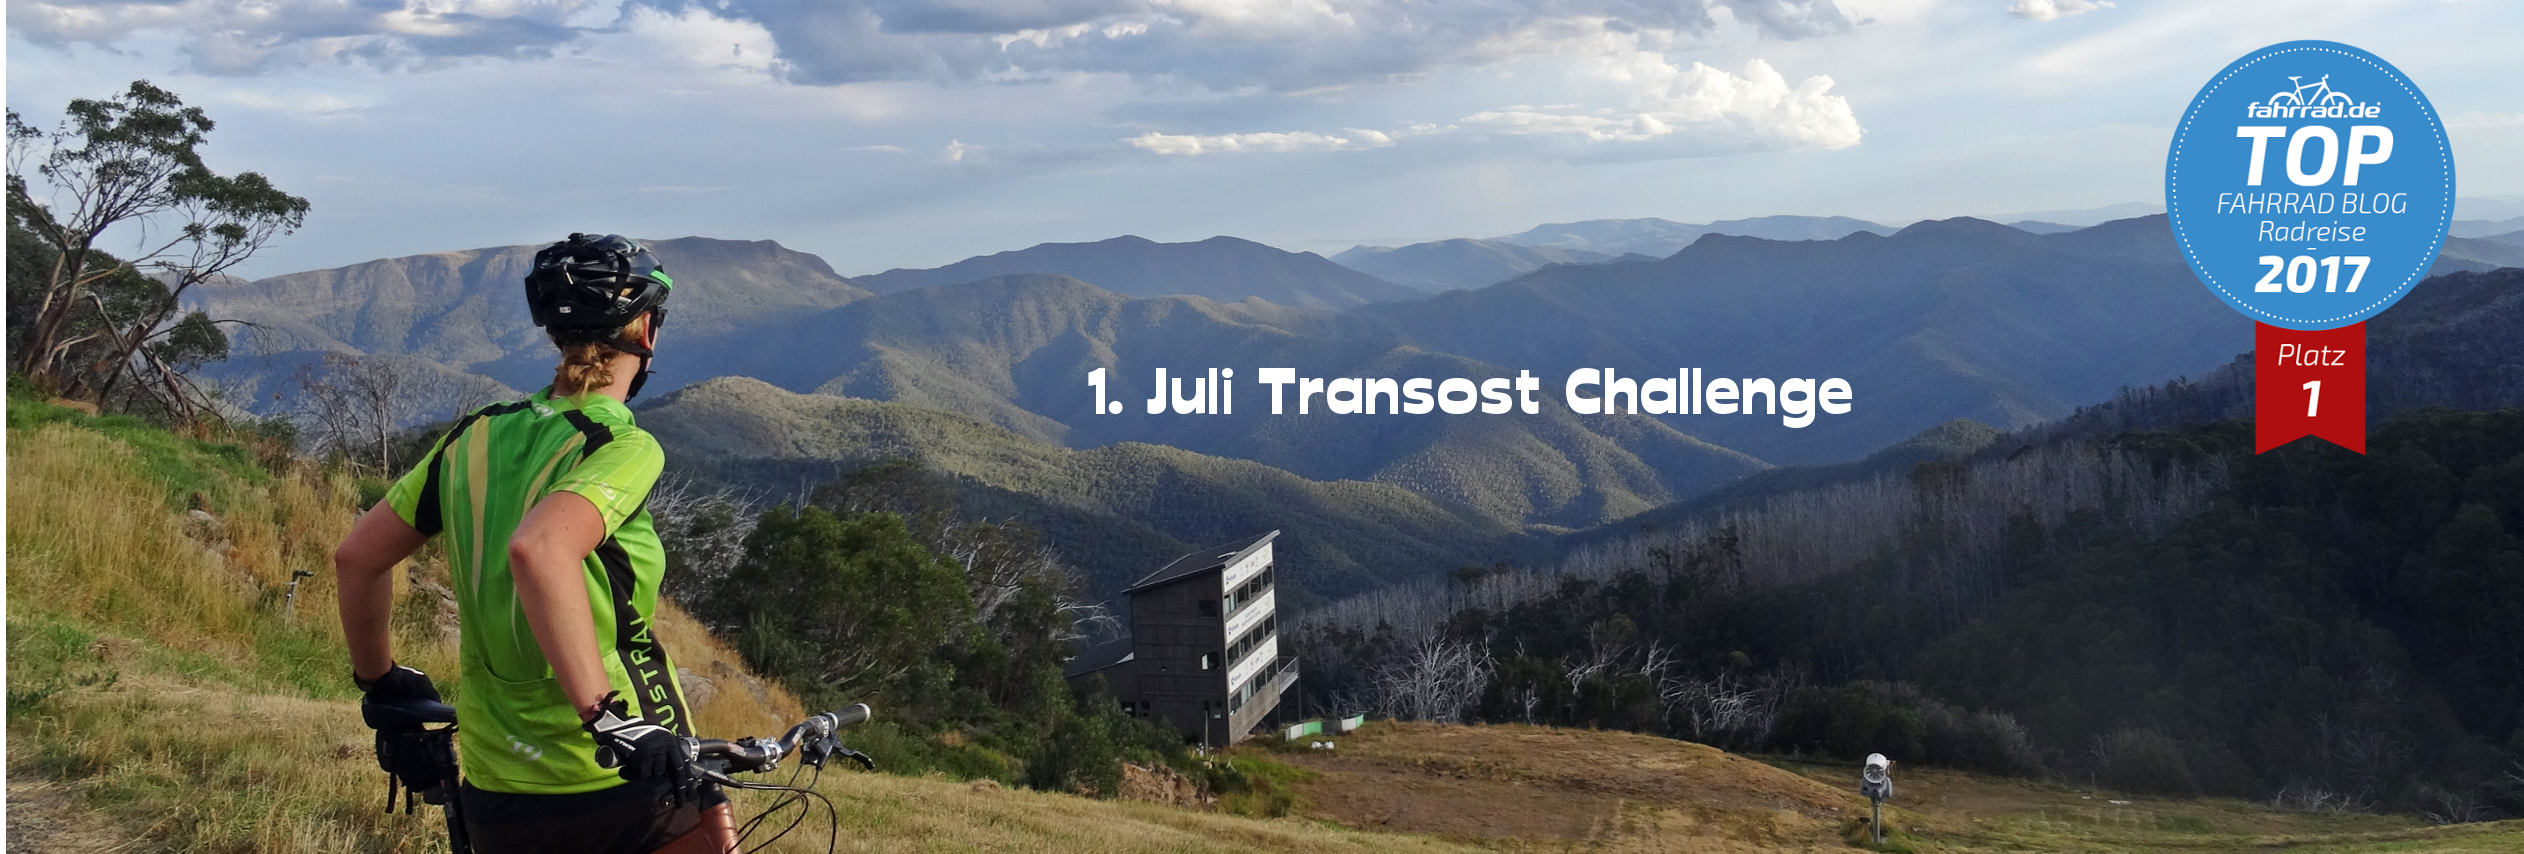 MTB Travel Girl Transost